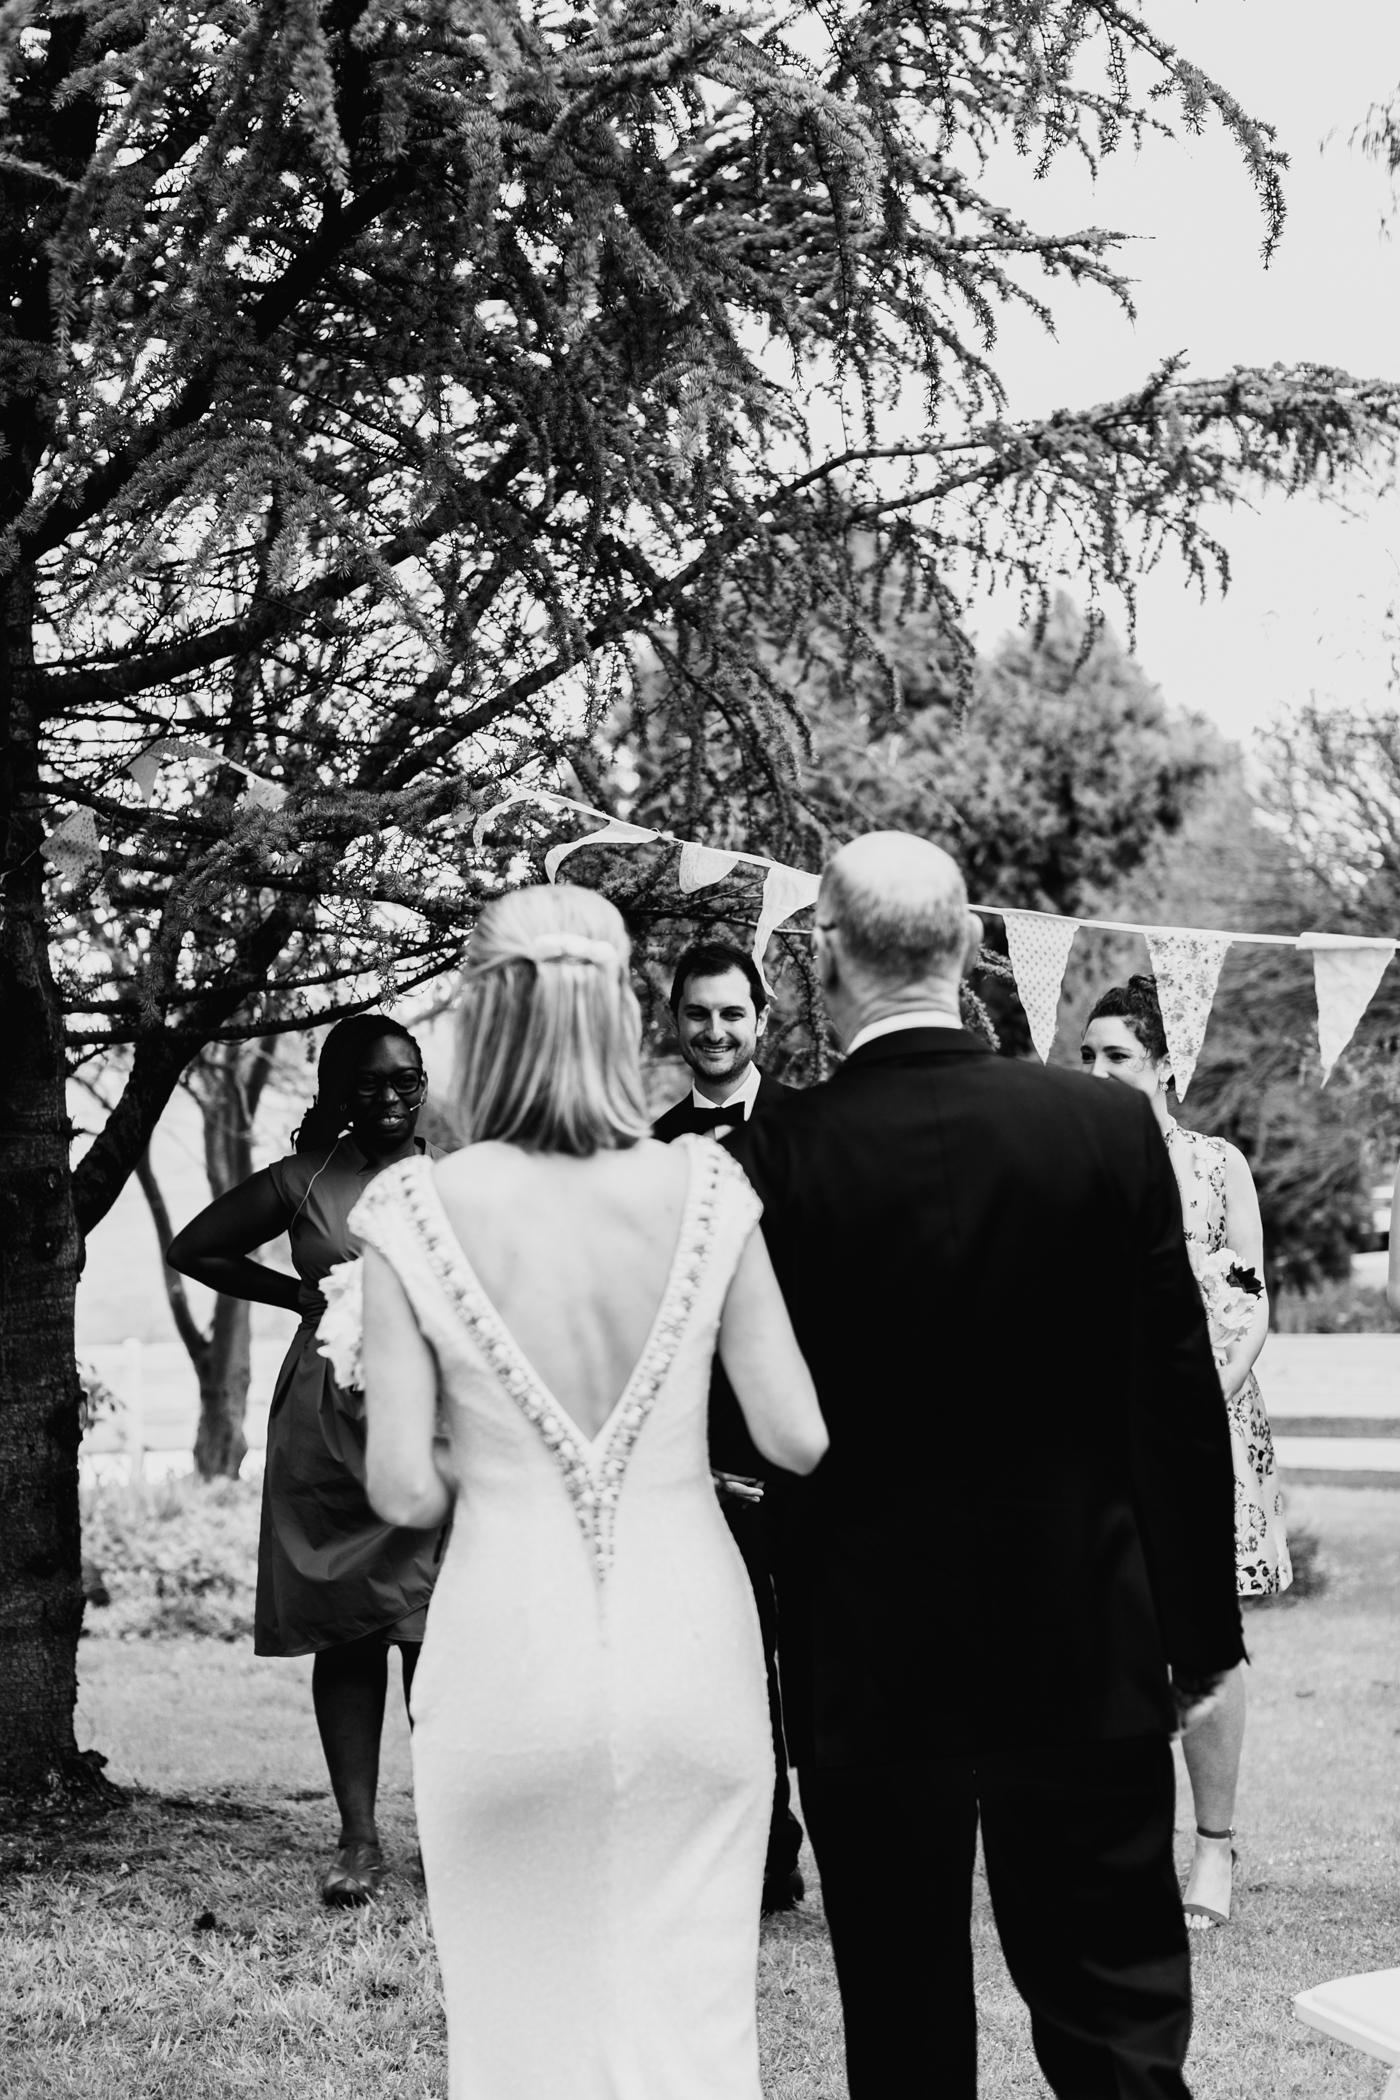 Bridget & James - Orange Country Wedding - Samantha Heather Photography-28.jpg